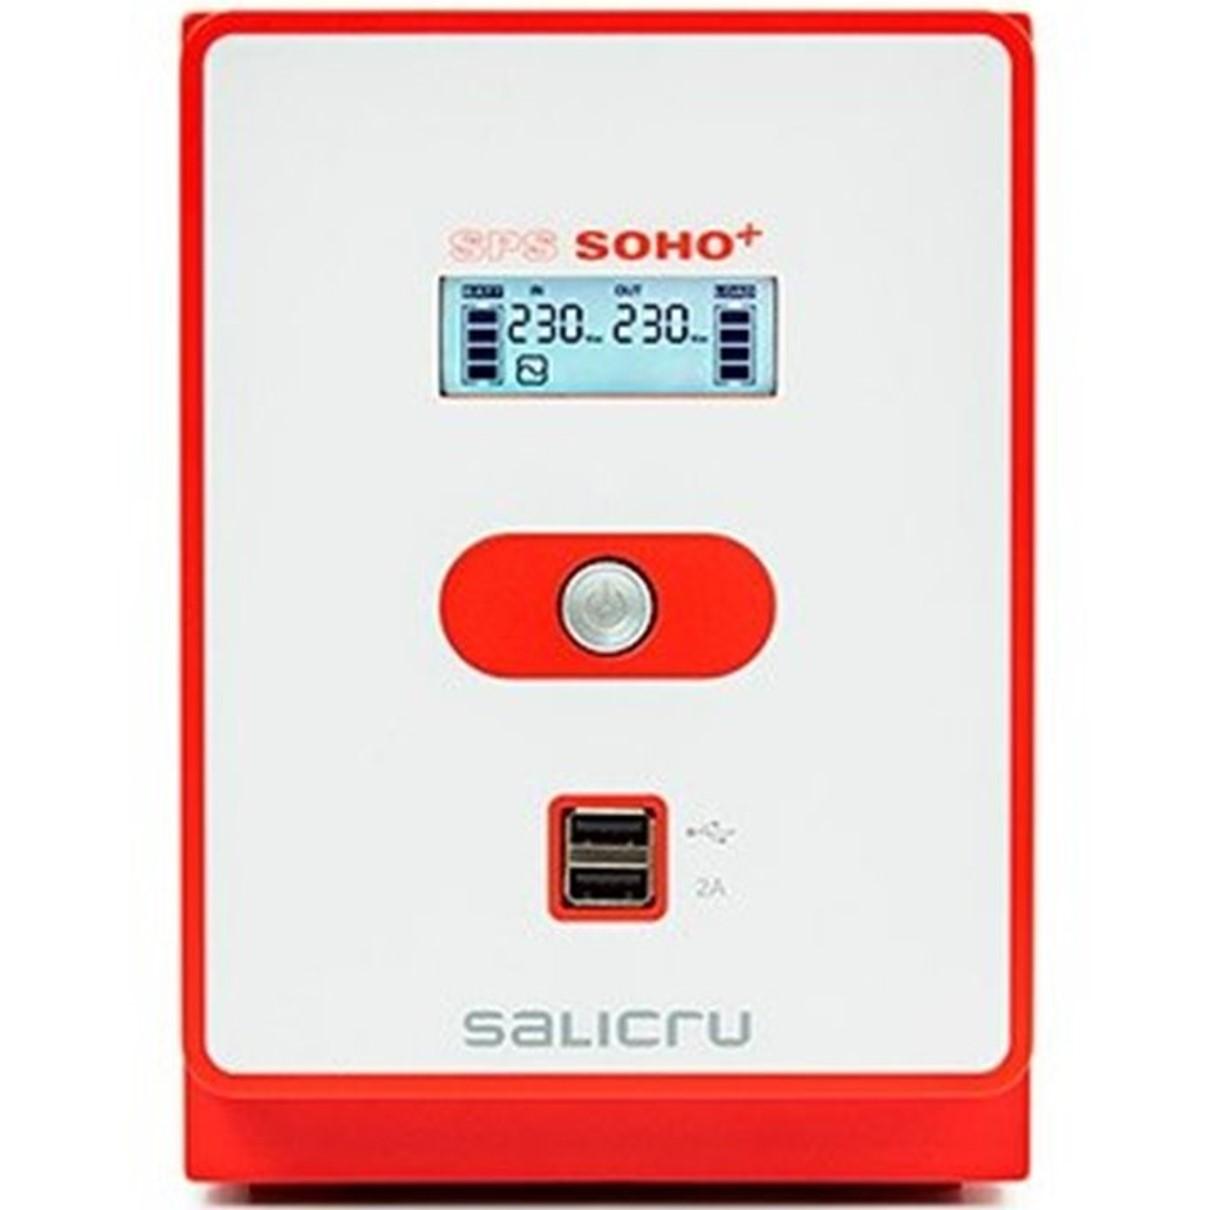 SPS2200SOHO+